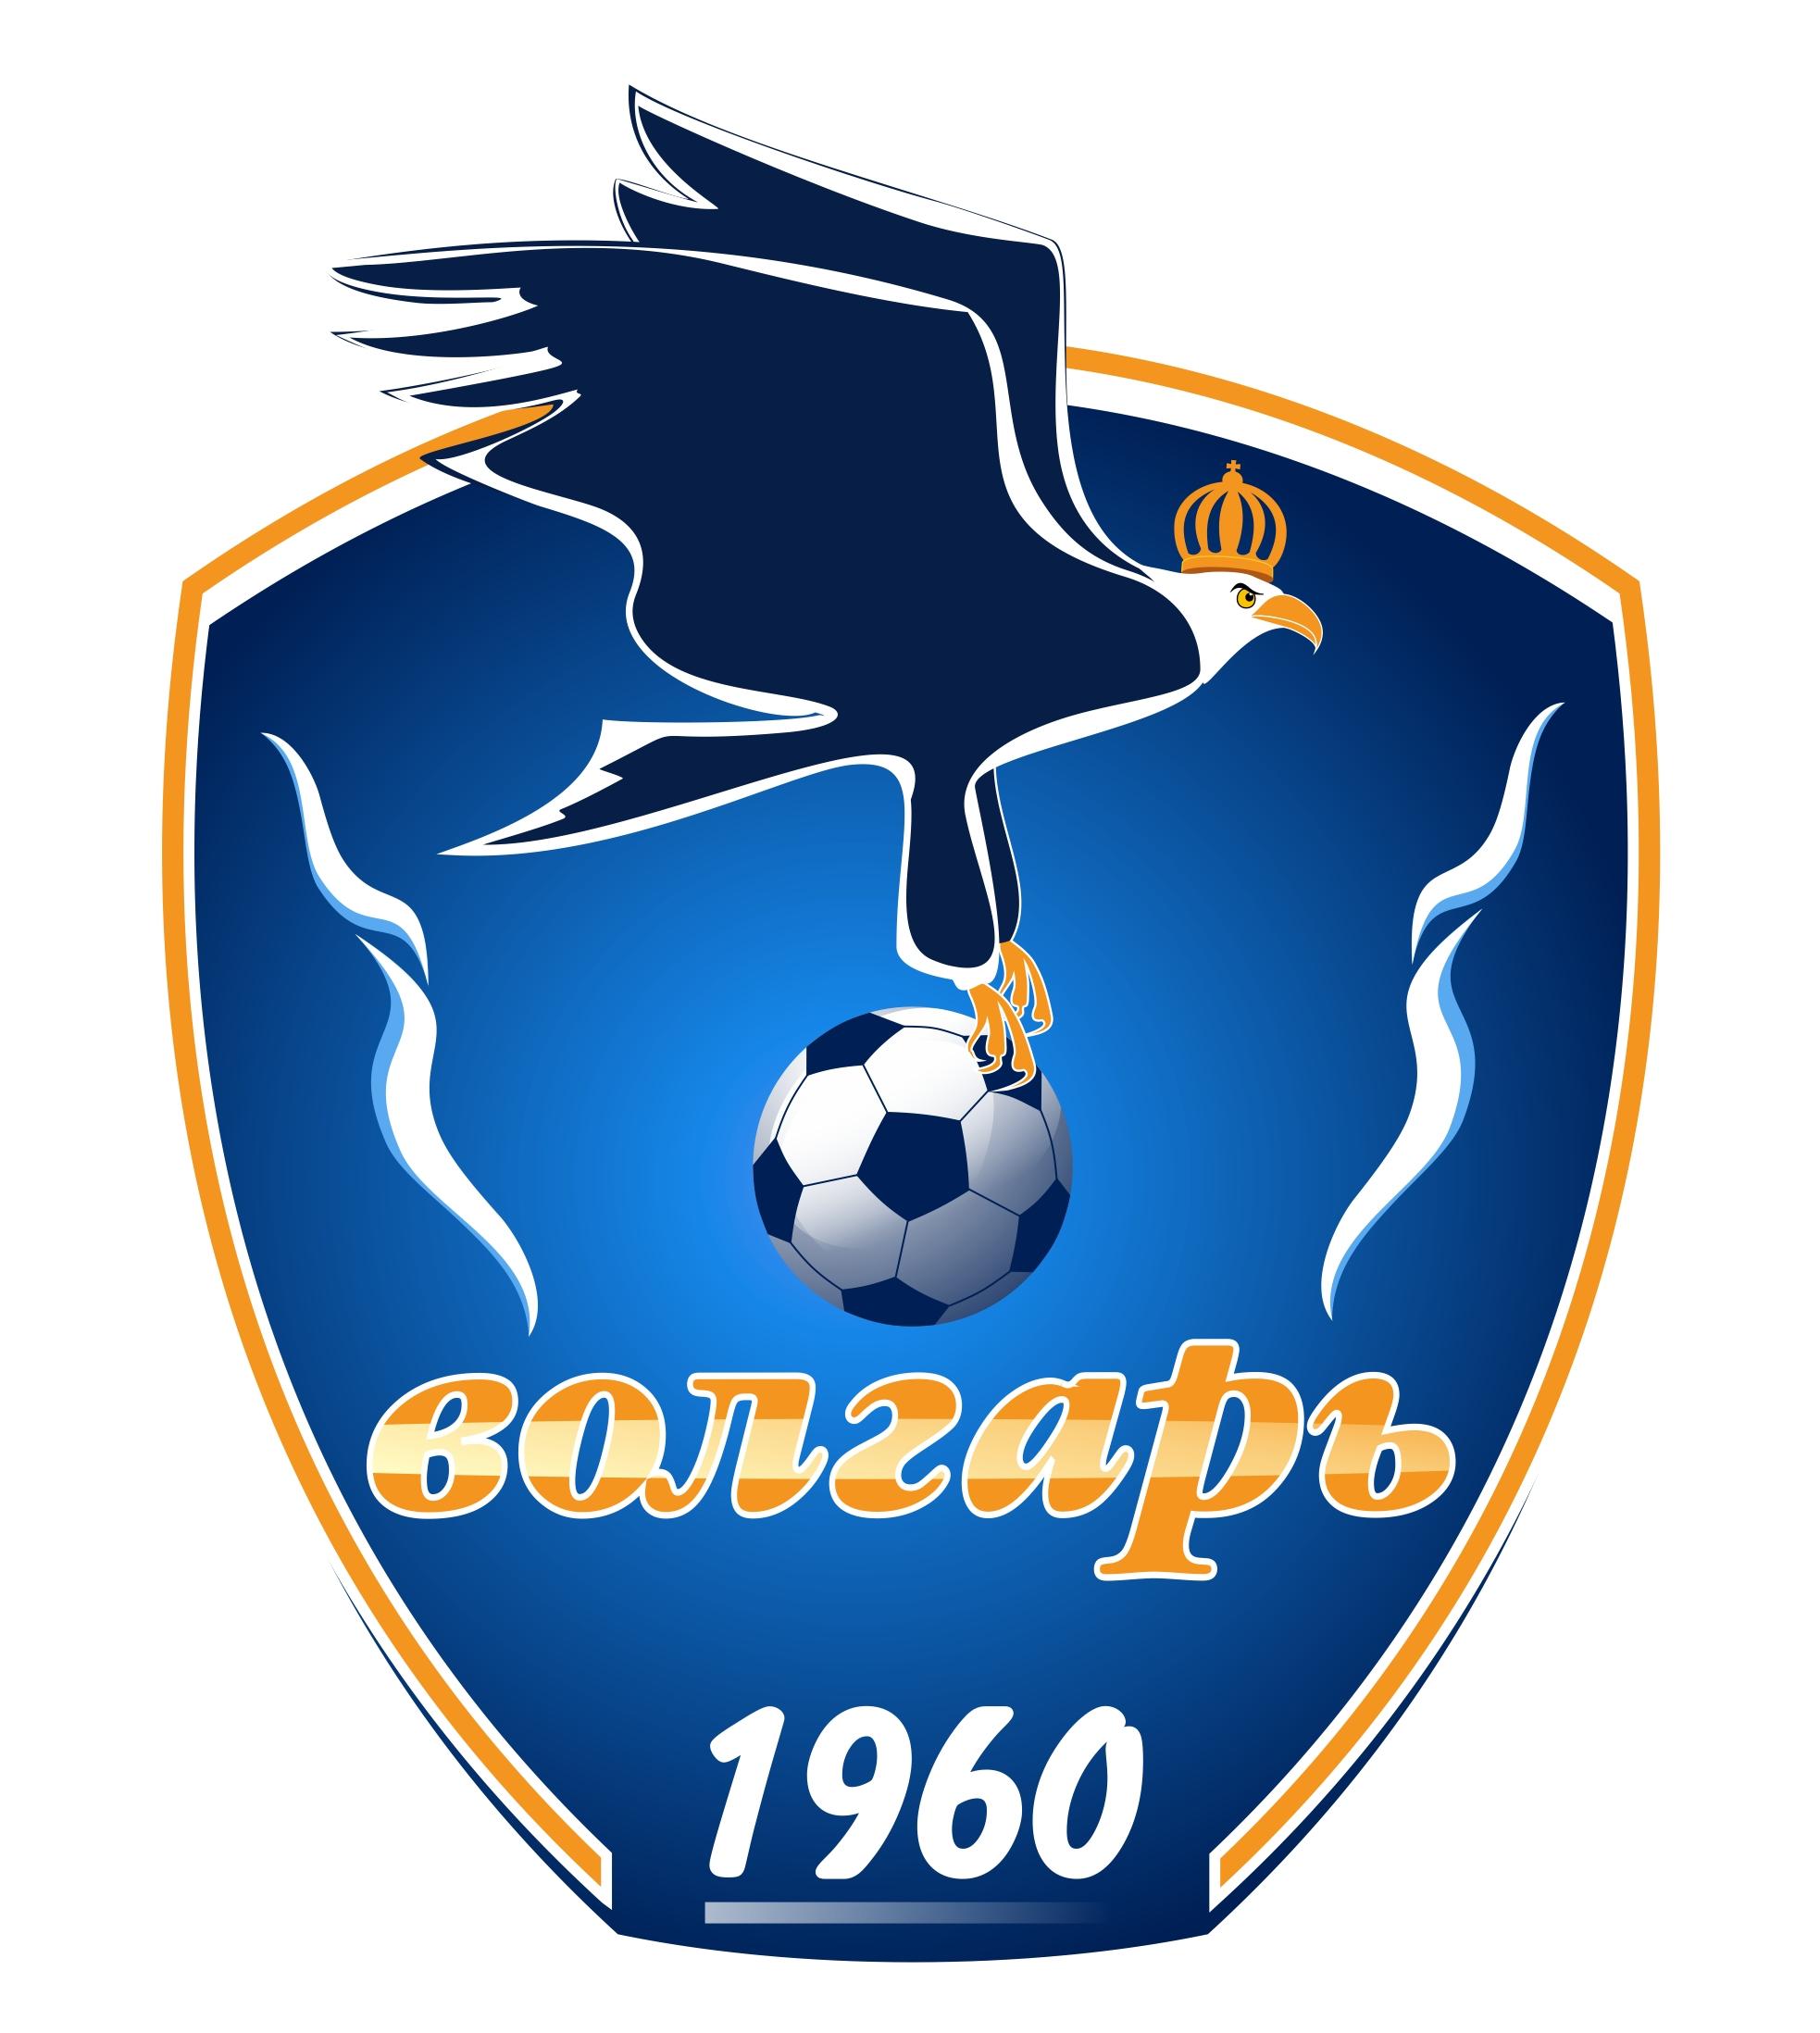 Разработка эмблемы футбольного клуба фото f_4fc25e1e5f173.jpg